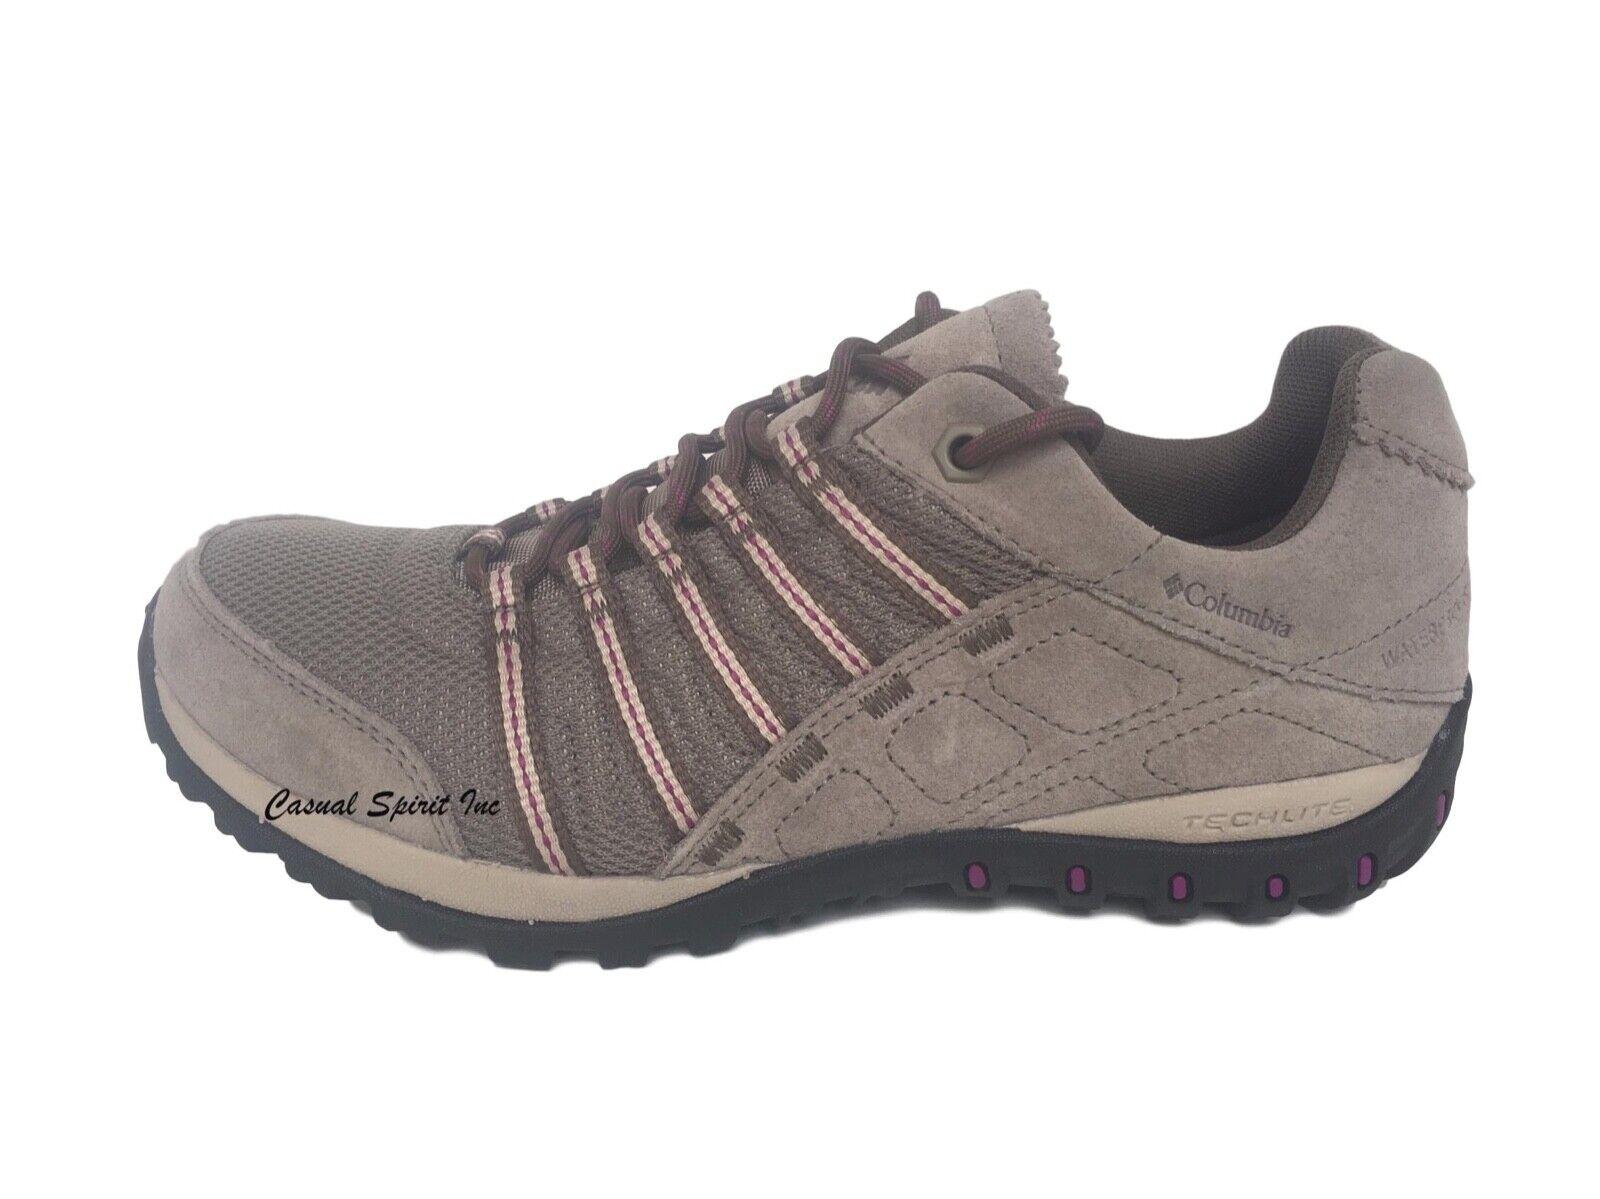 Nuevo  Para Mujer Columbia Acueducto II Omni Tech Impermeable Senderismo Trail Zapatos